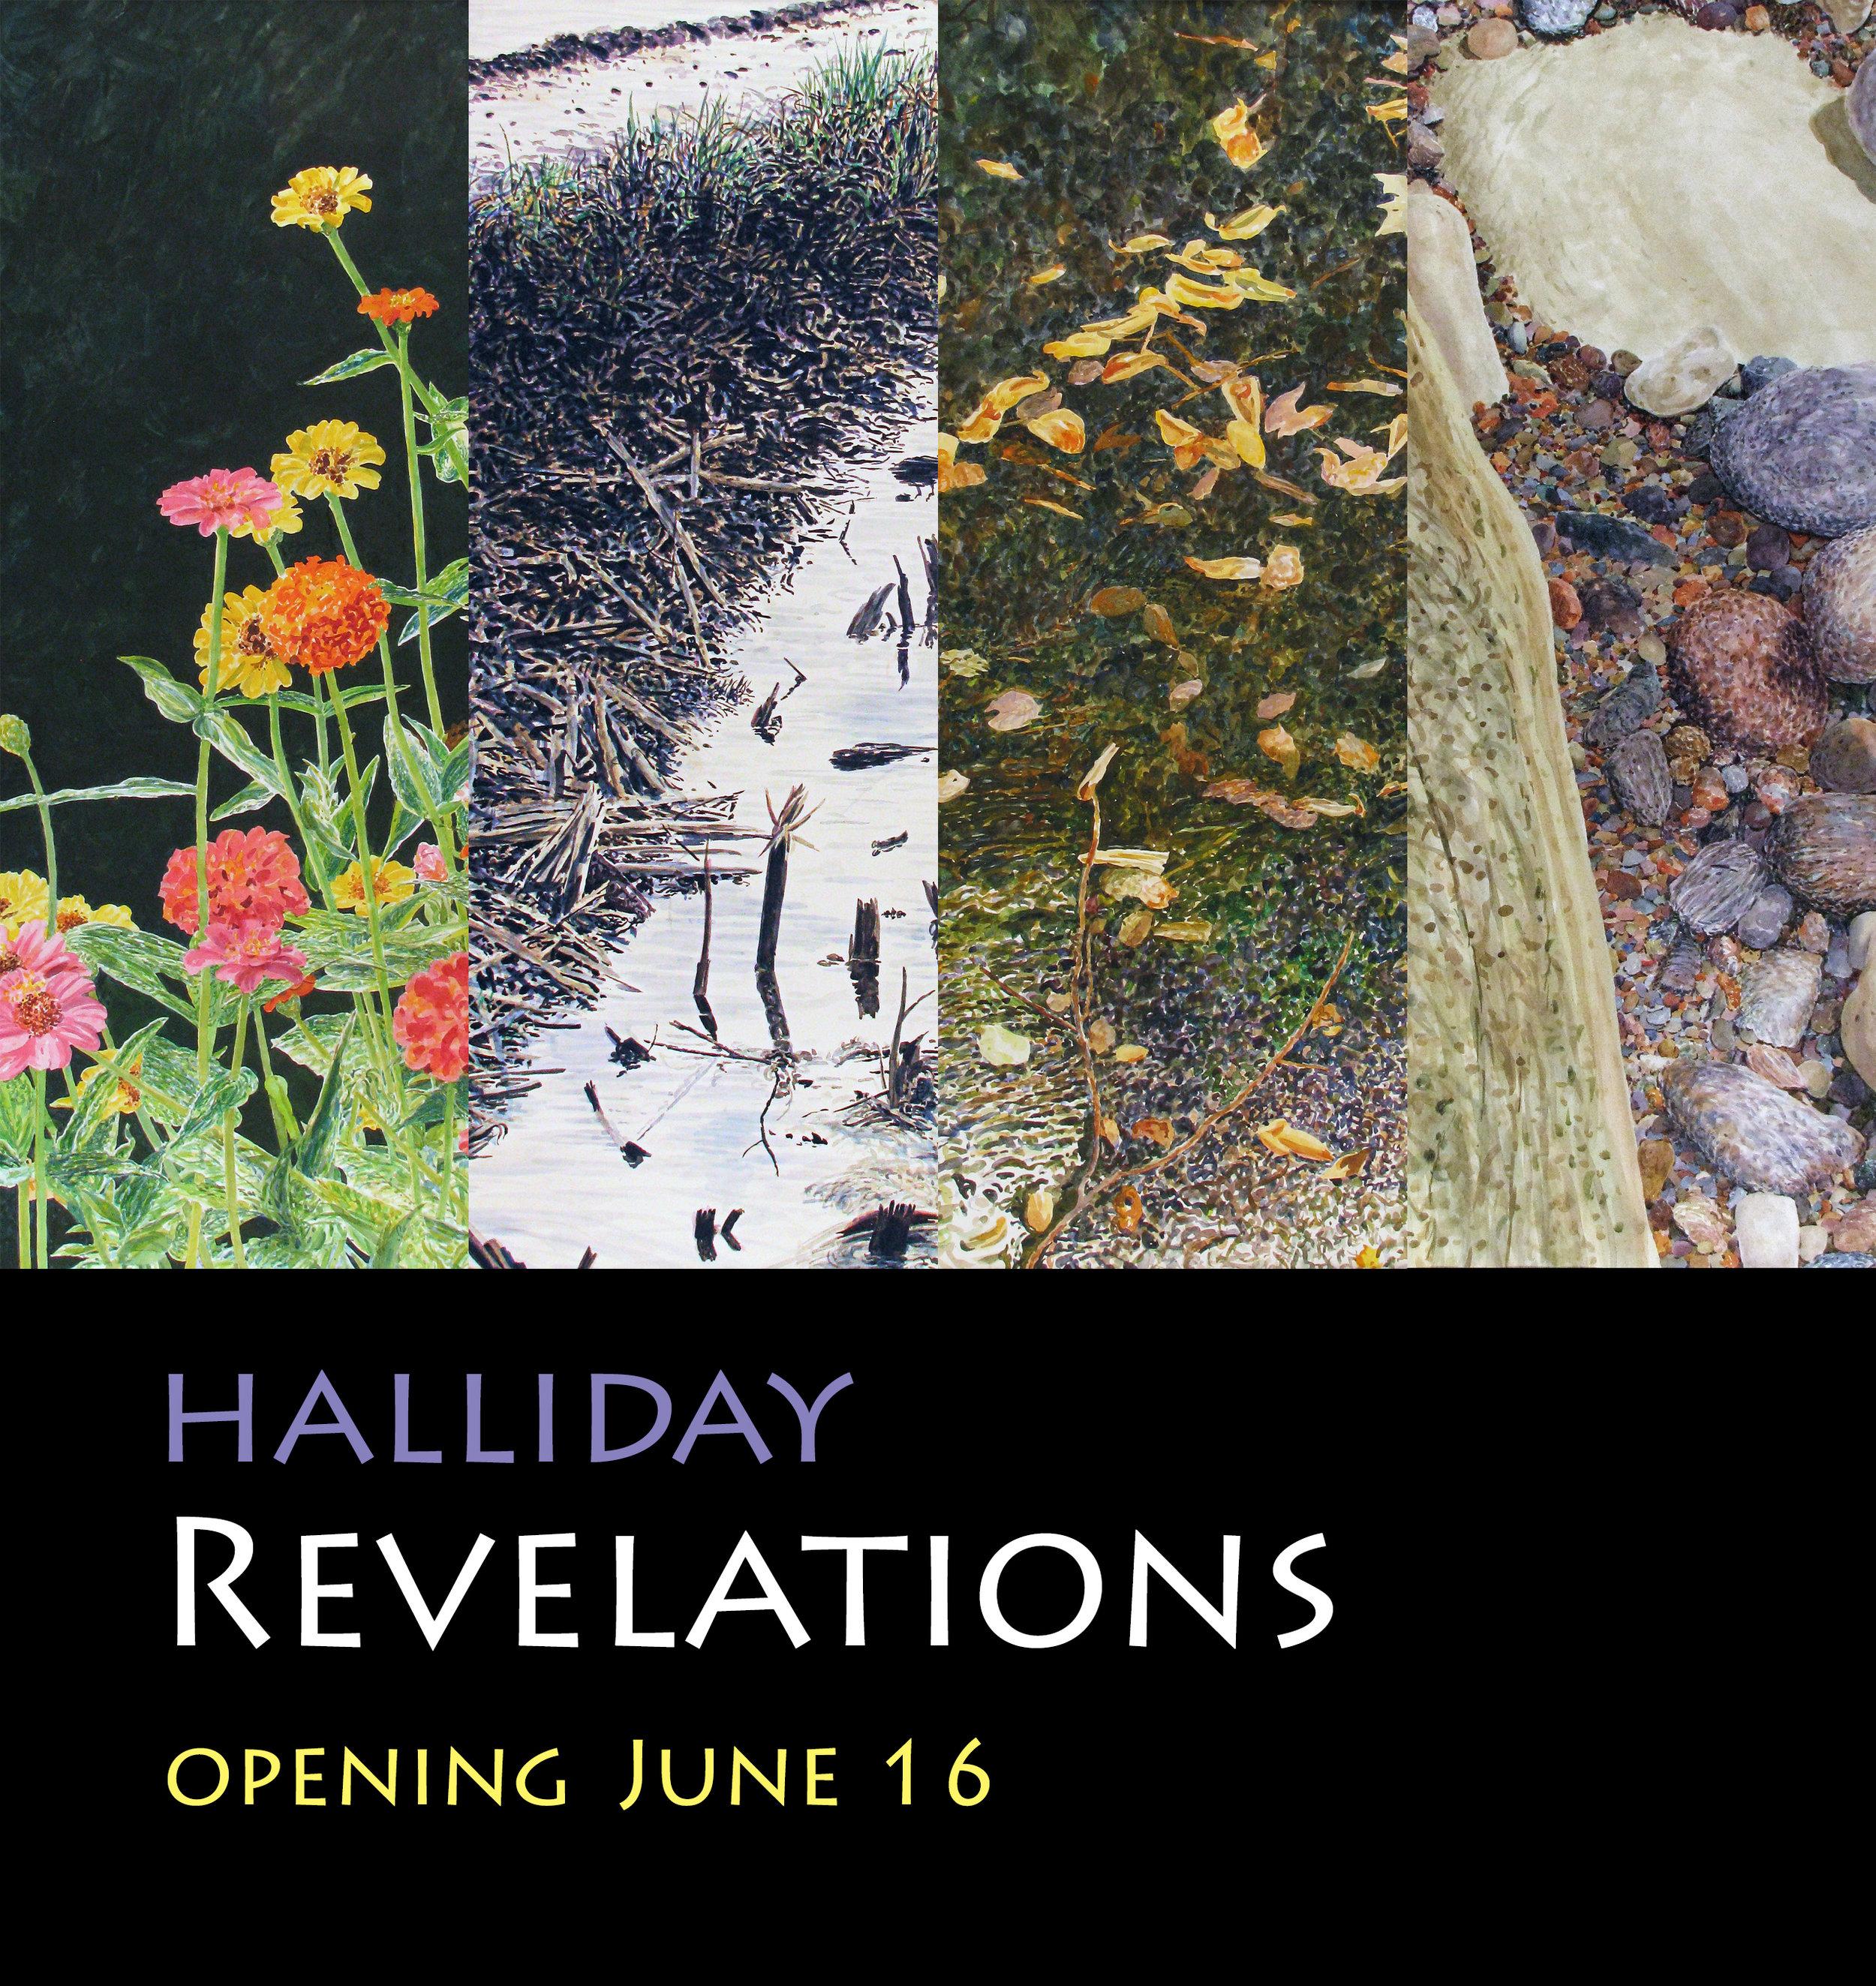 Revelations Theme Image Counter Card.jpg